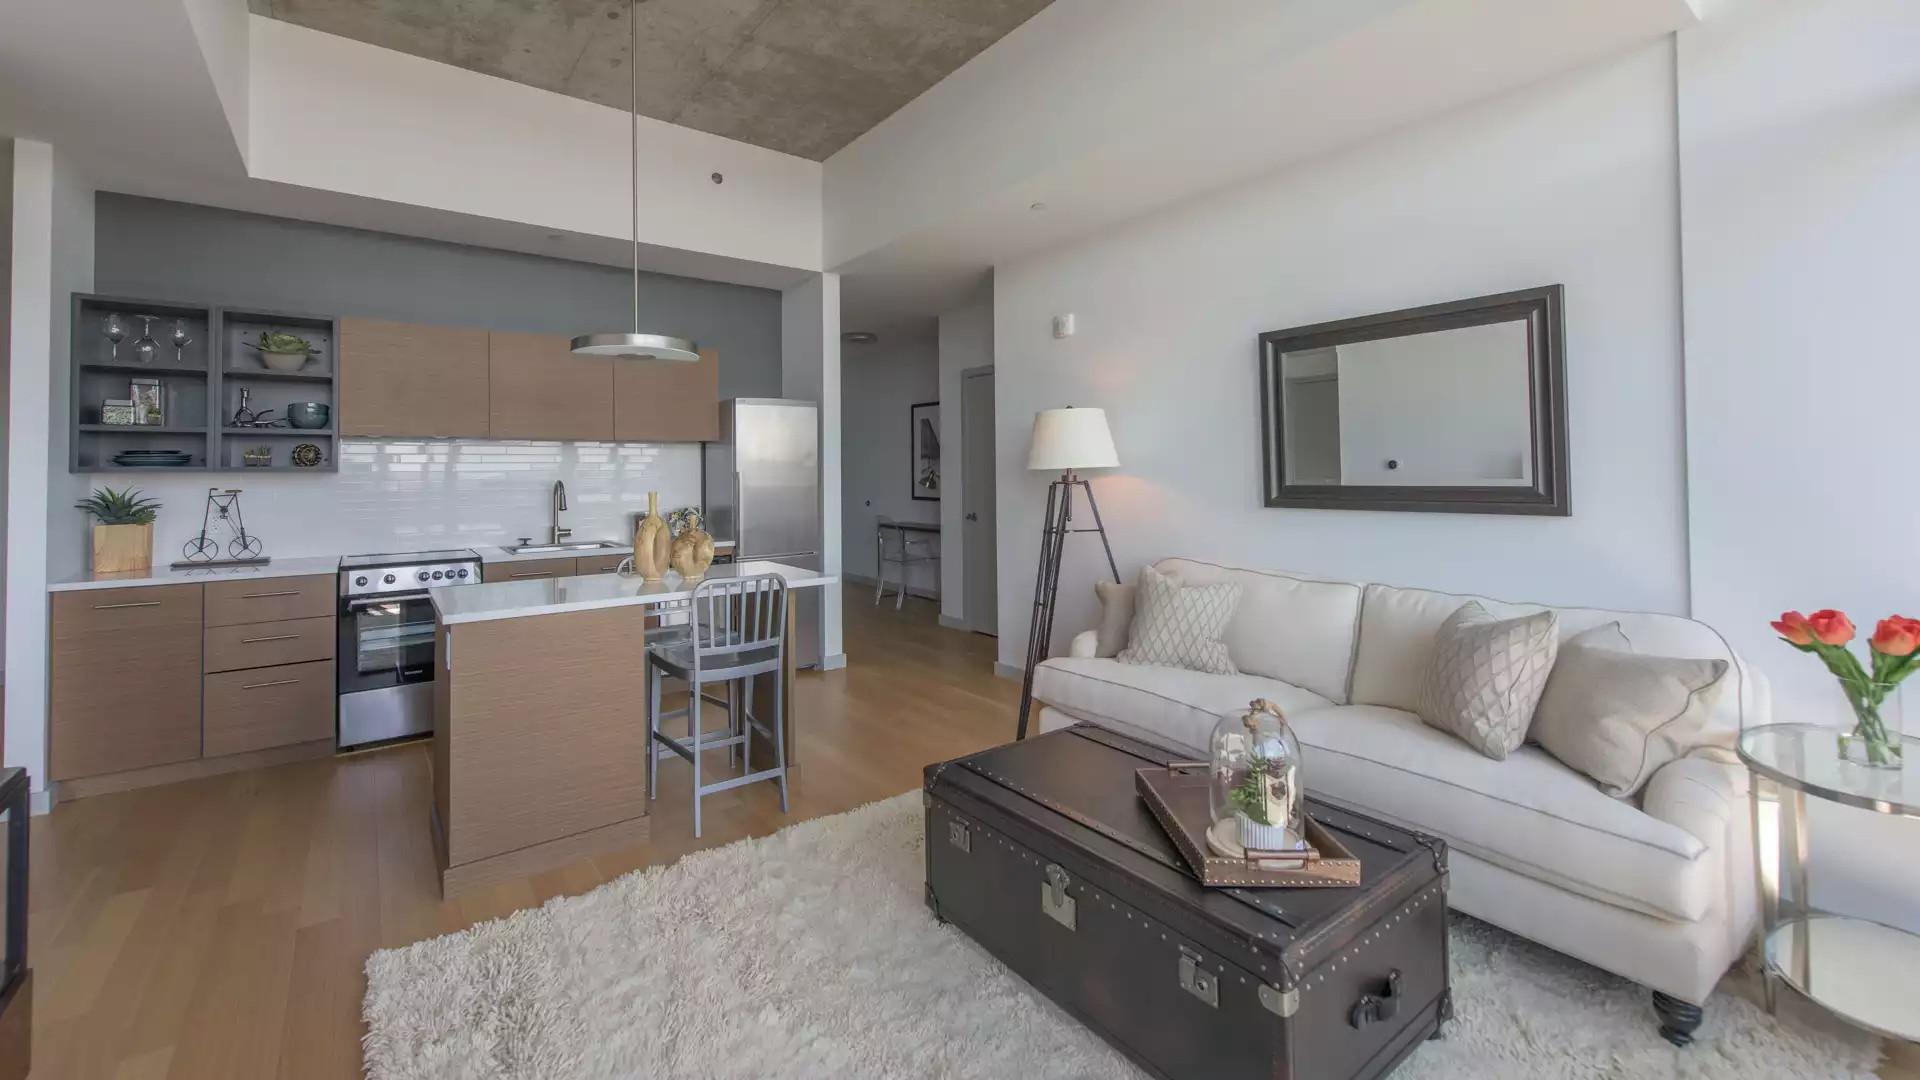 315 on A Apartments - Boston, MA